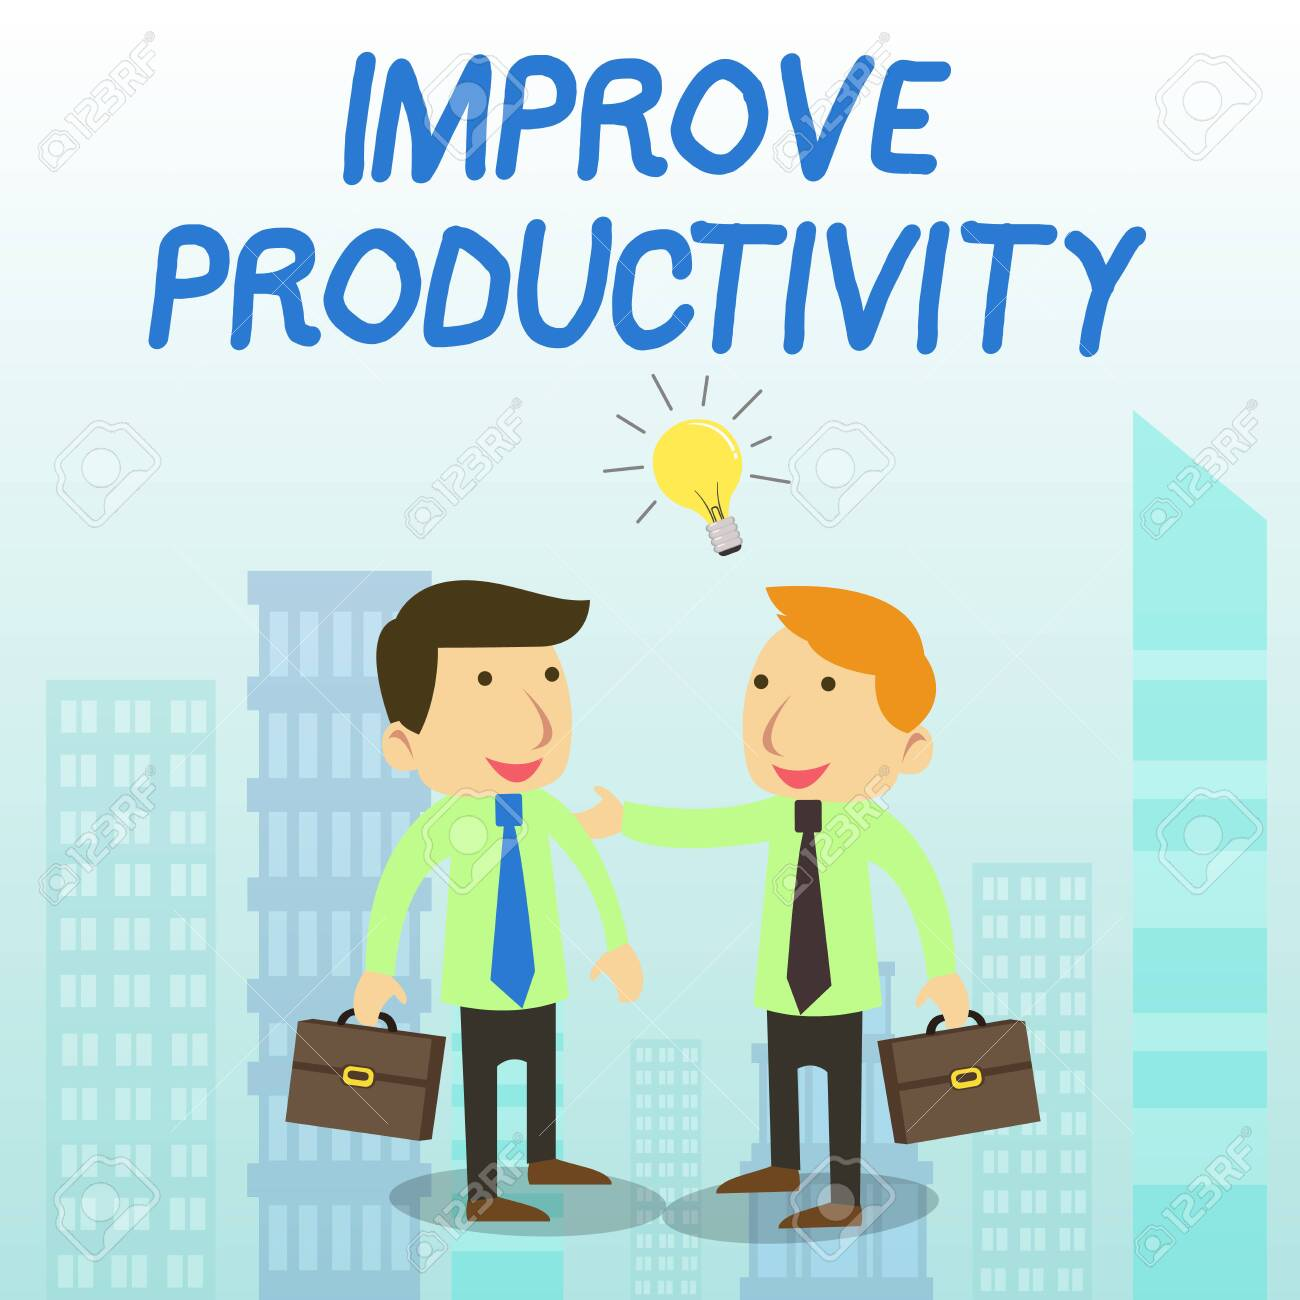 125272453 word writing text improve productivity business photo showcasing to increase the machine and process - راه حل هایی جهت افزایش بهره وری در کسب و کار